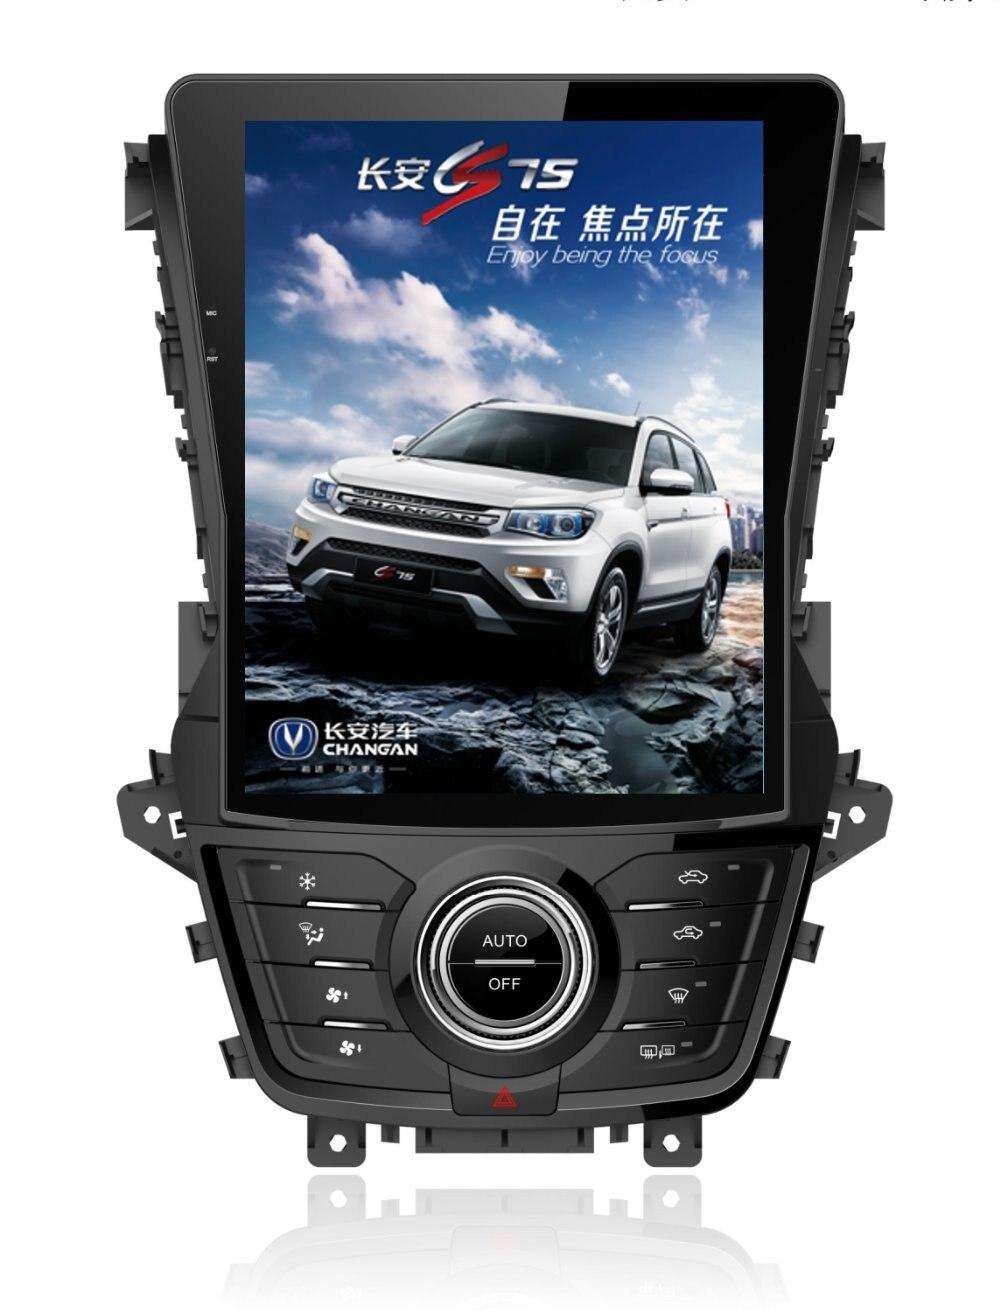 "Otojeta Vertical 10"" Quad Core Android 6.0 2gb ram Car DVD player For changan CS75 2014-2016 gps navi Multimedia stereo headunit"